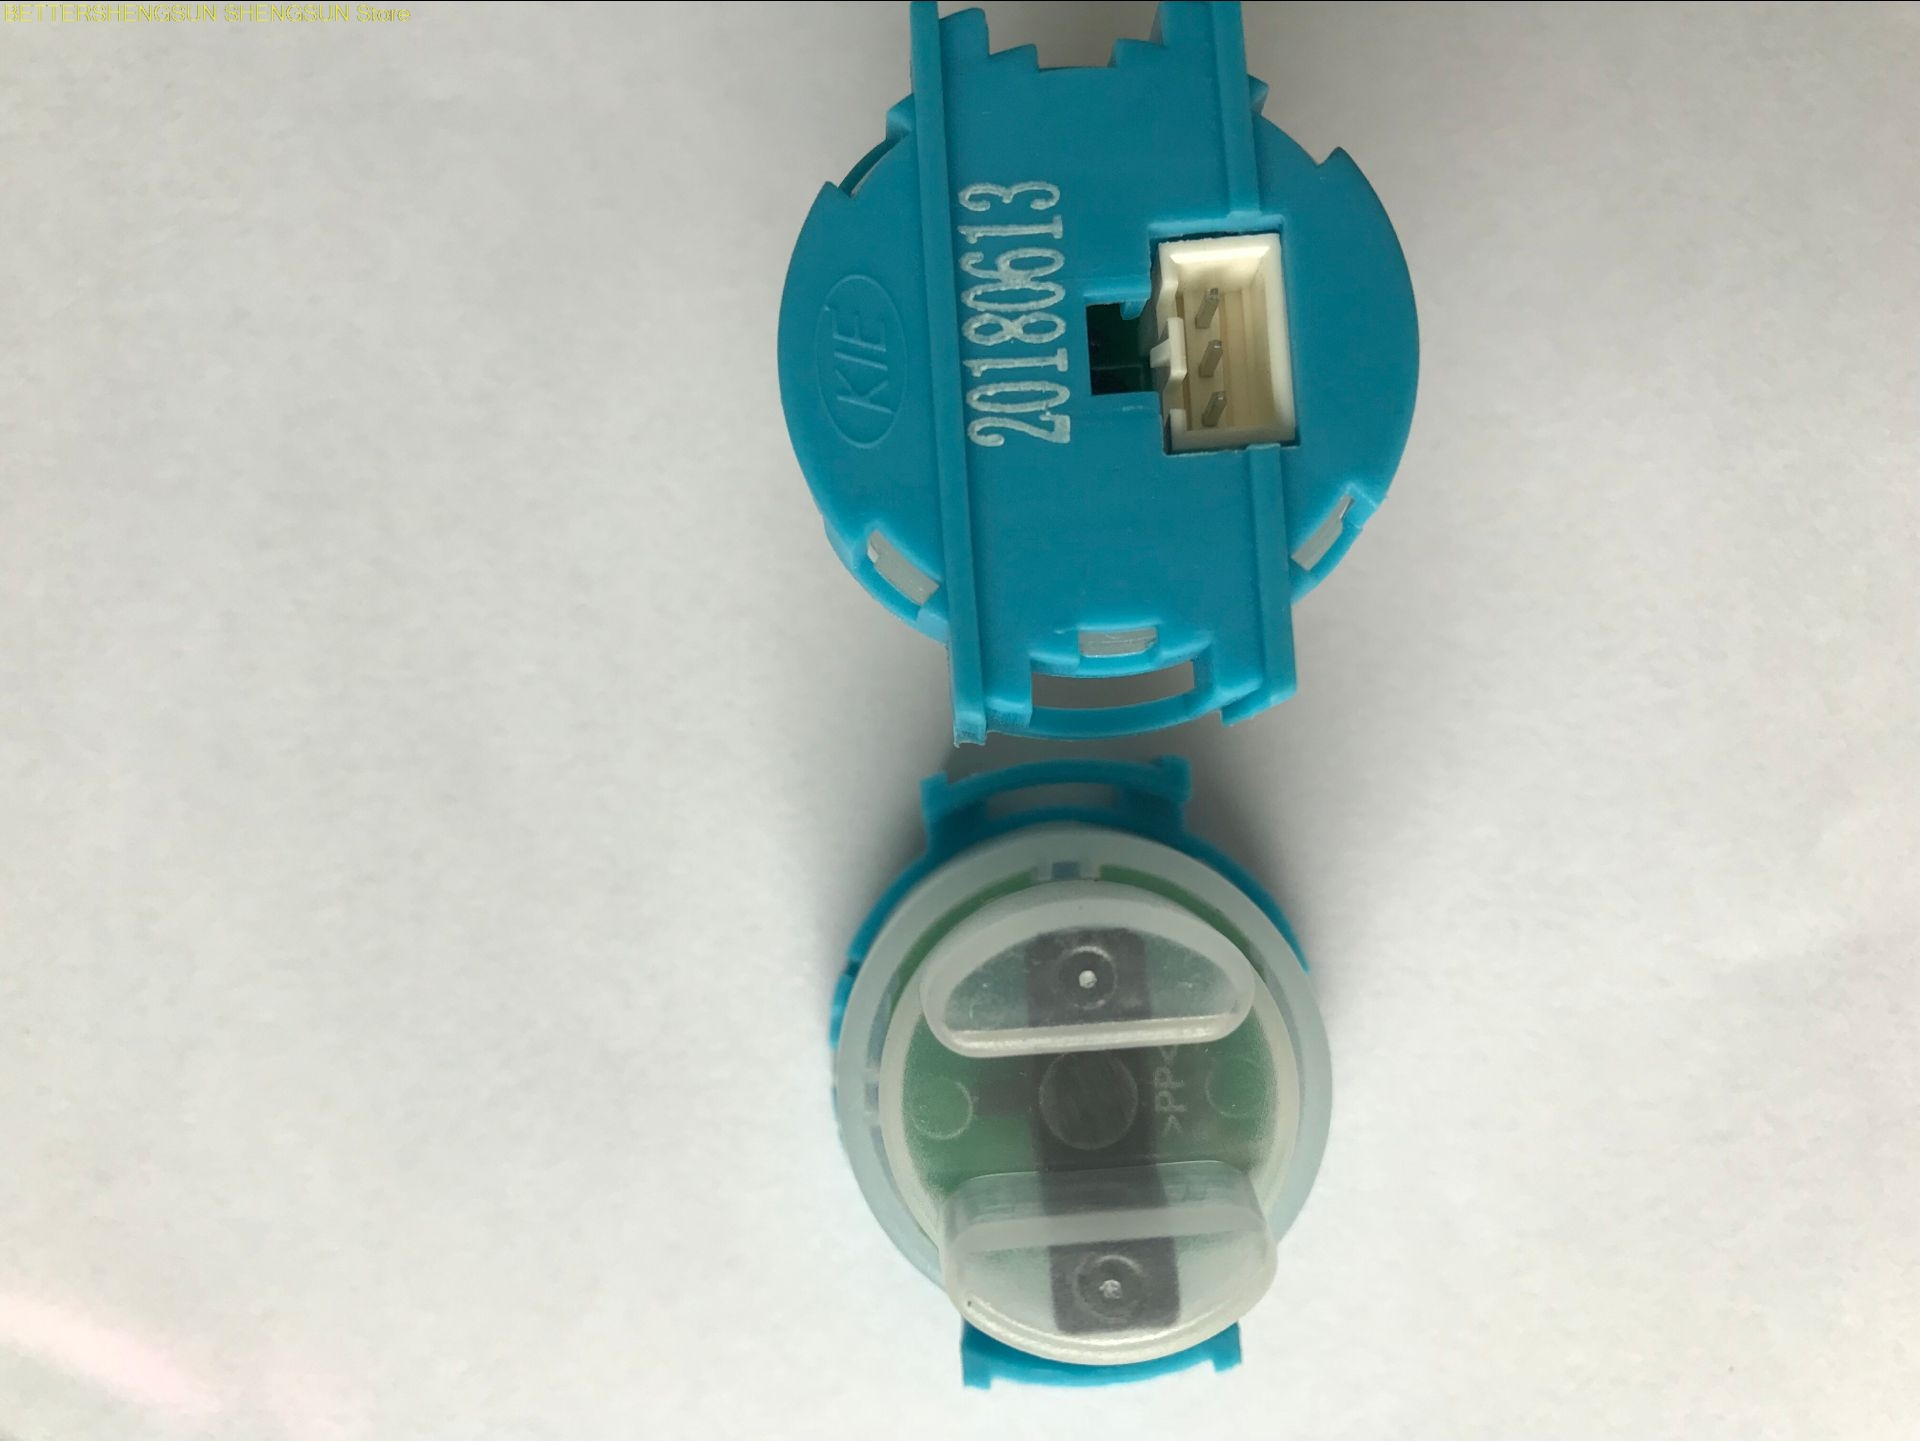 Dishwasher Turbidity Sensor TS 300B Export Turbidity Sensor in ABS Sensor from Automobiles Motorcycles